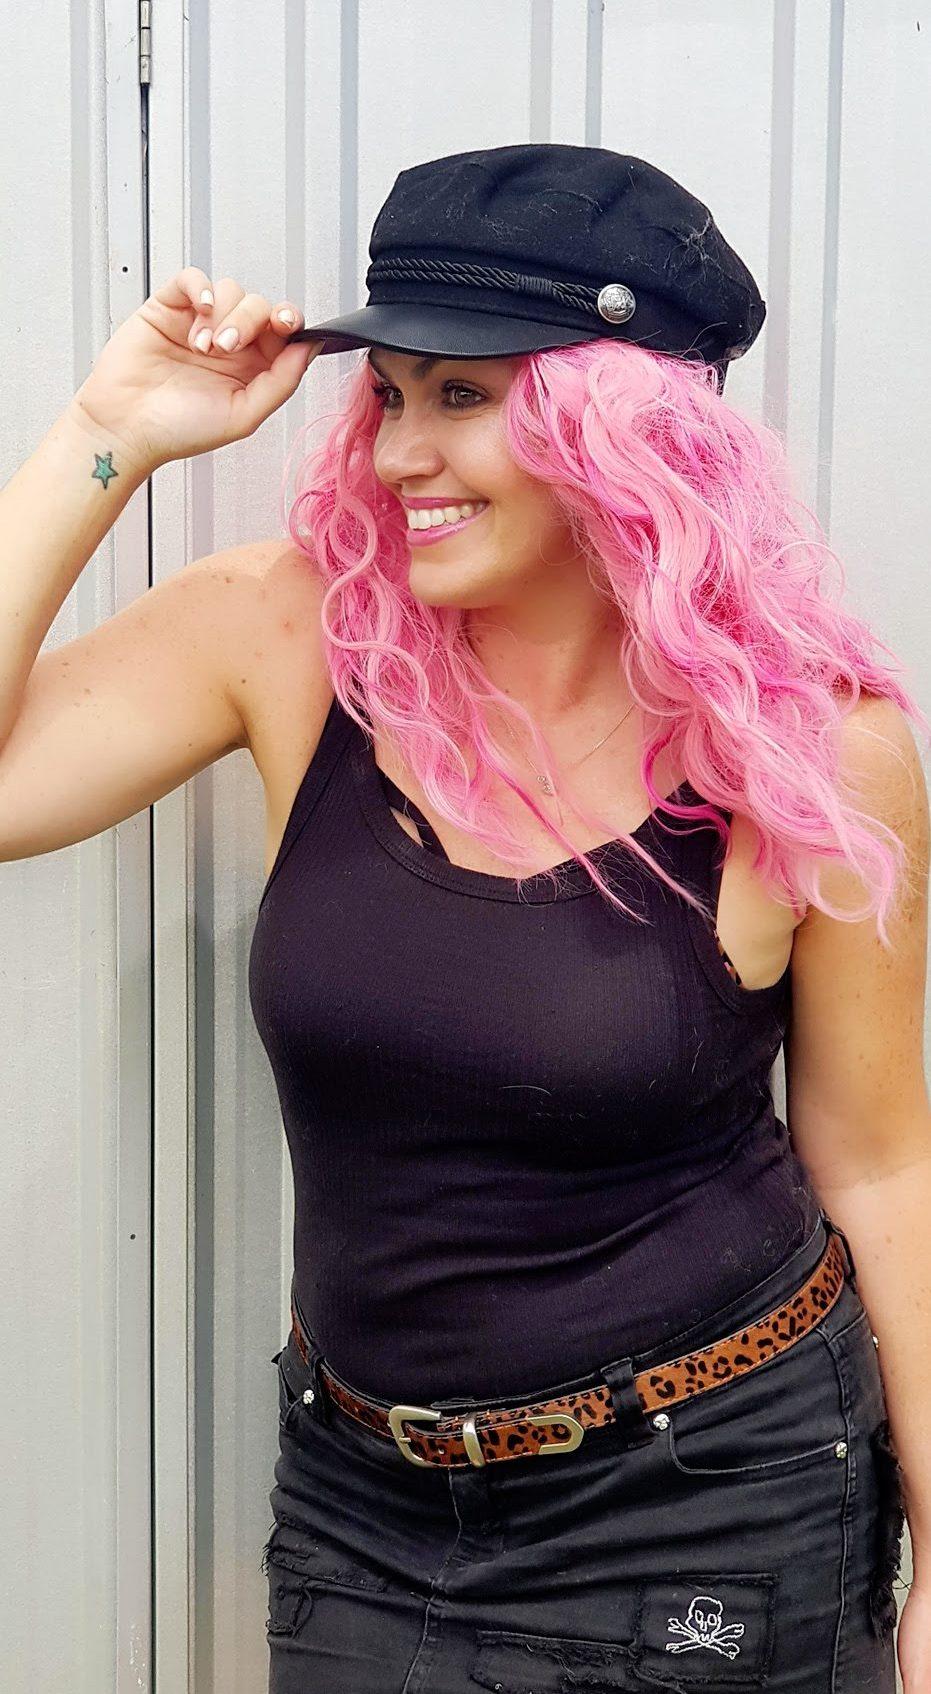 samantha clark waters confidence blog lifestyle fashion pink hair hat